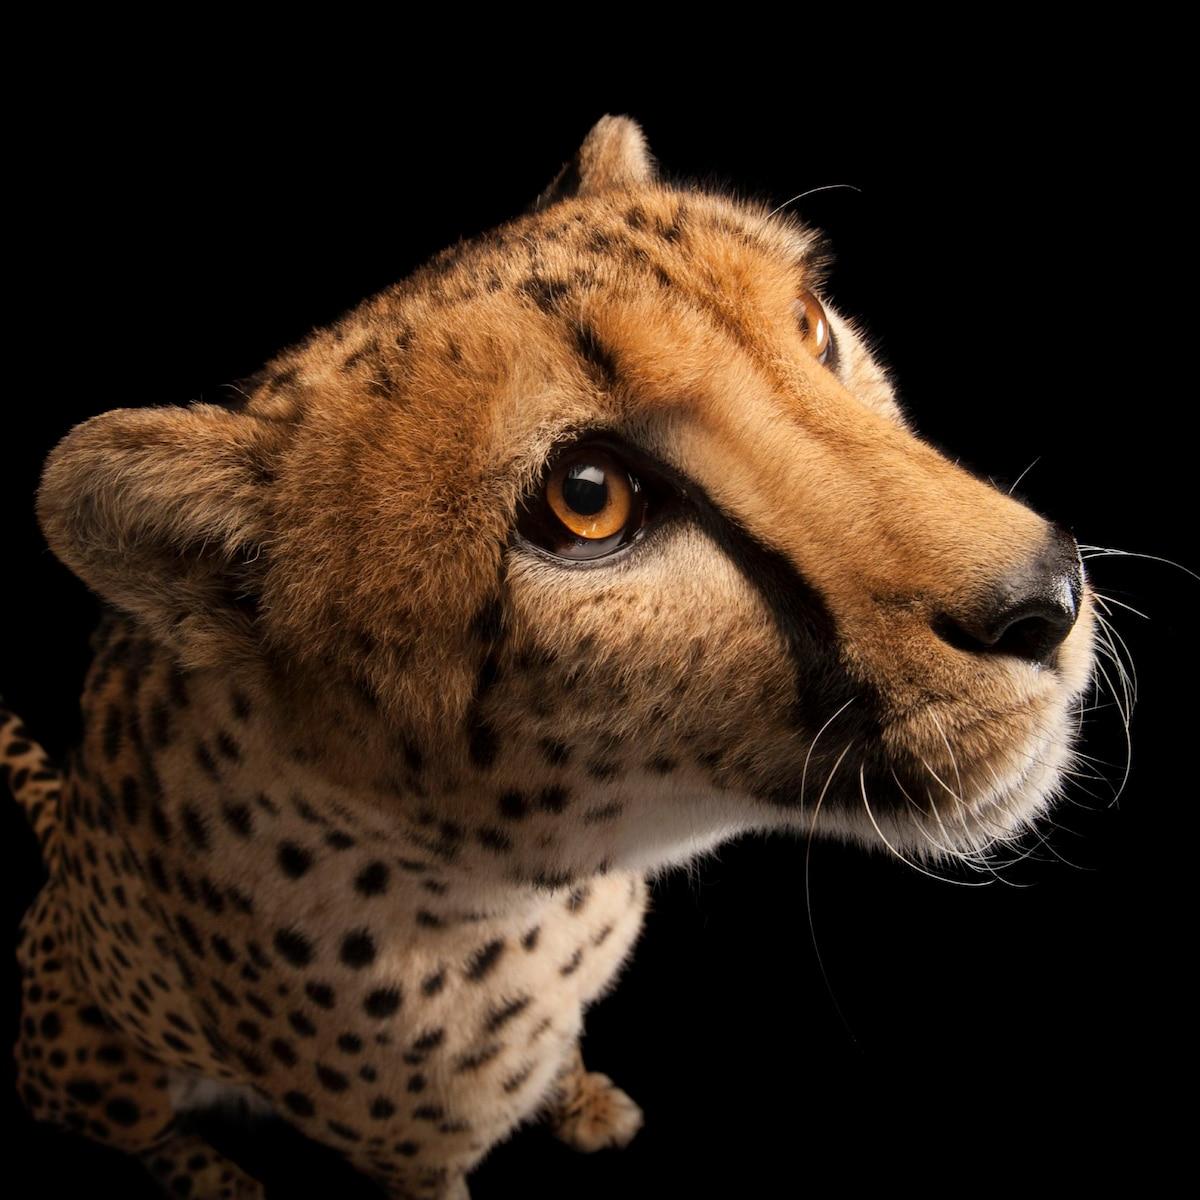 Cheetah | The Animal Spot